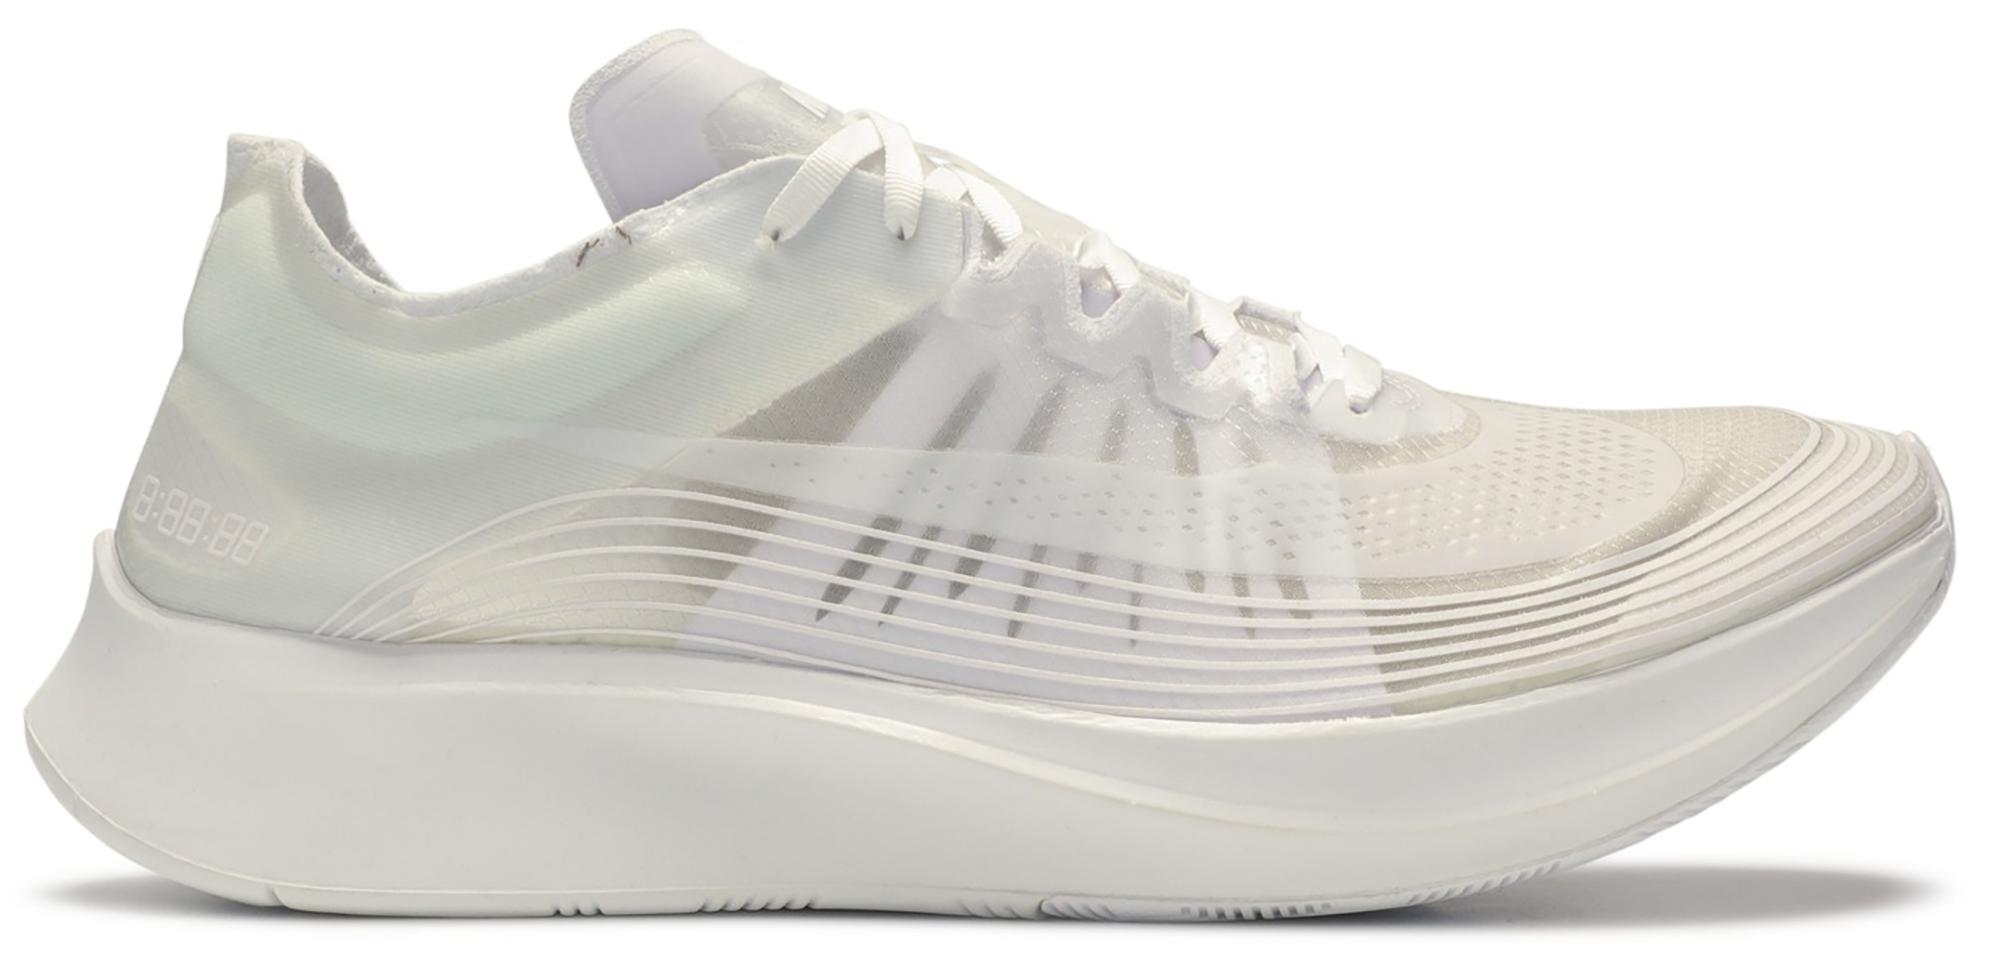 Nike Zoom Fly SP Triple White - BQ7024-100